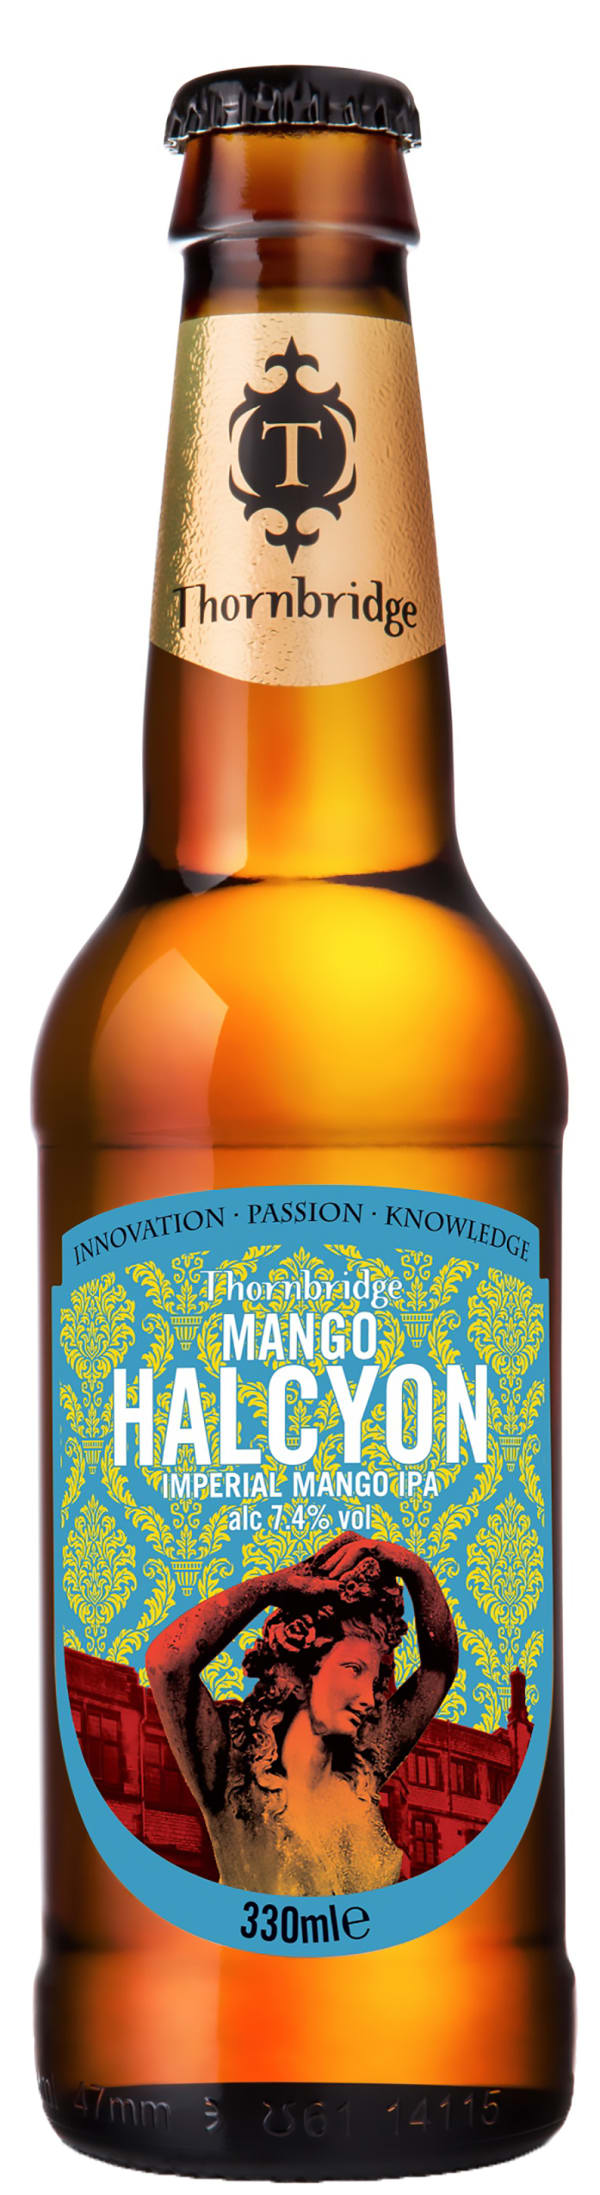 Thornbridge Halcyon Imperial Mango IPA